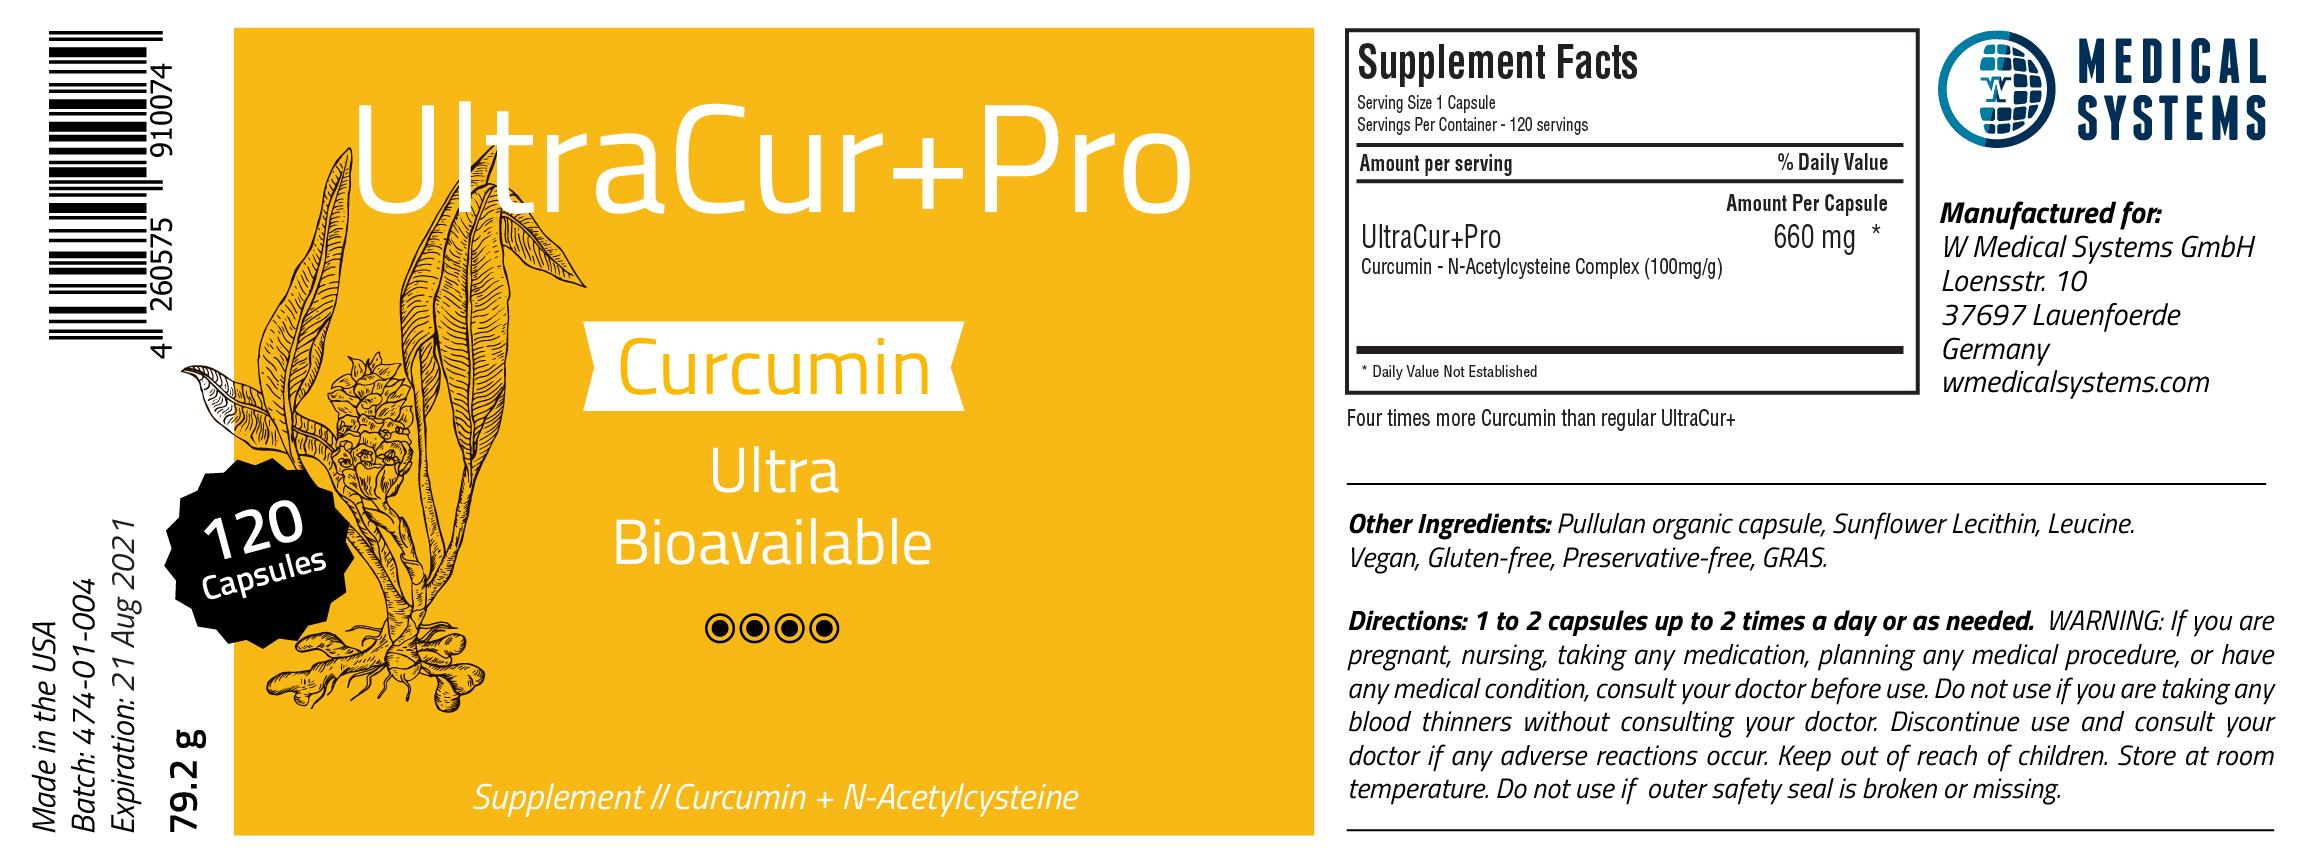 UltraCur+Pro EN Large